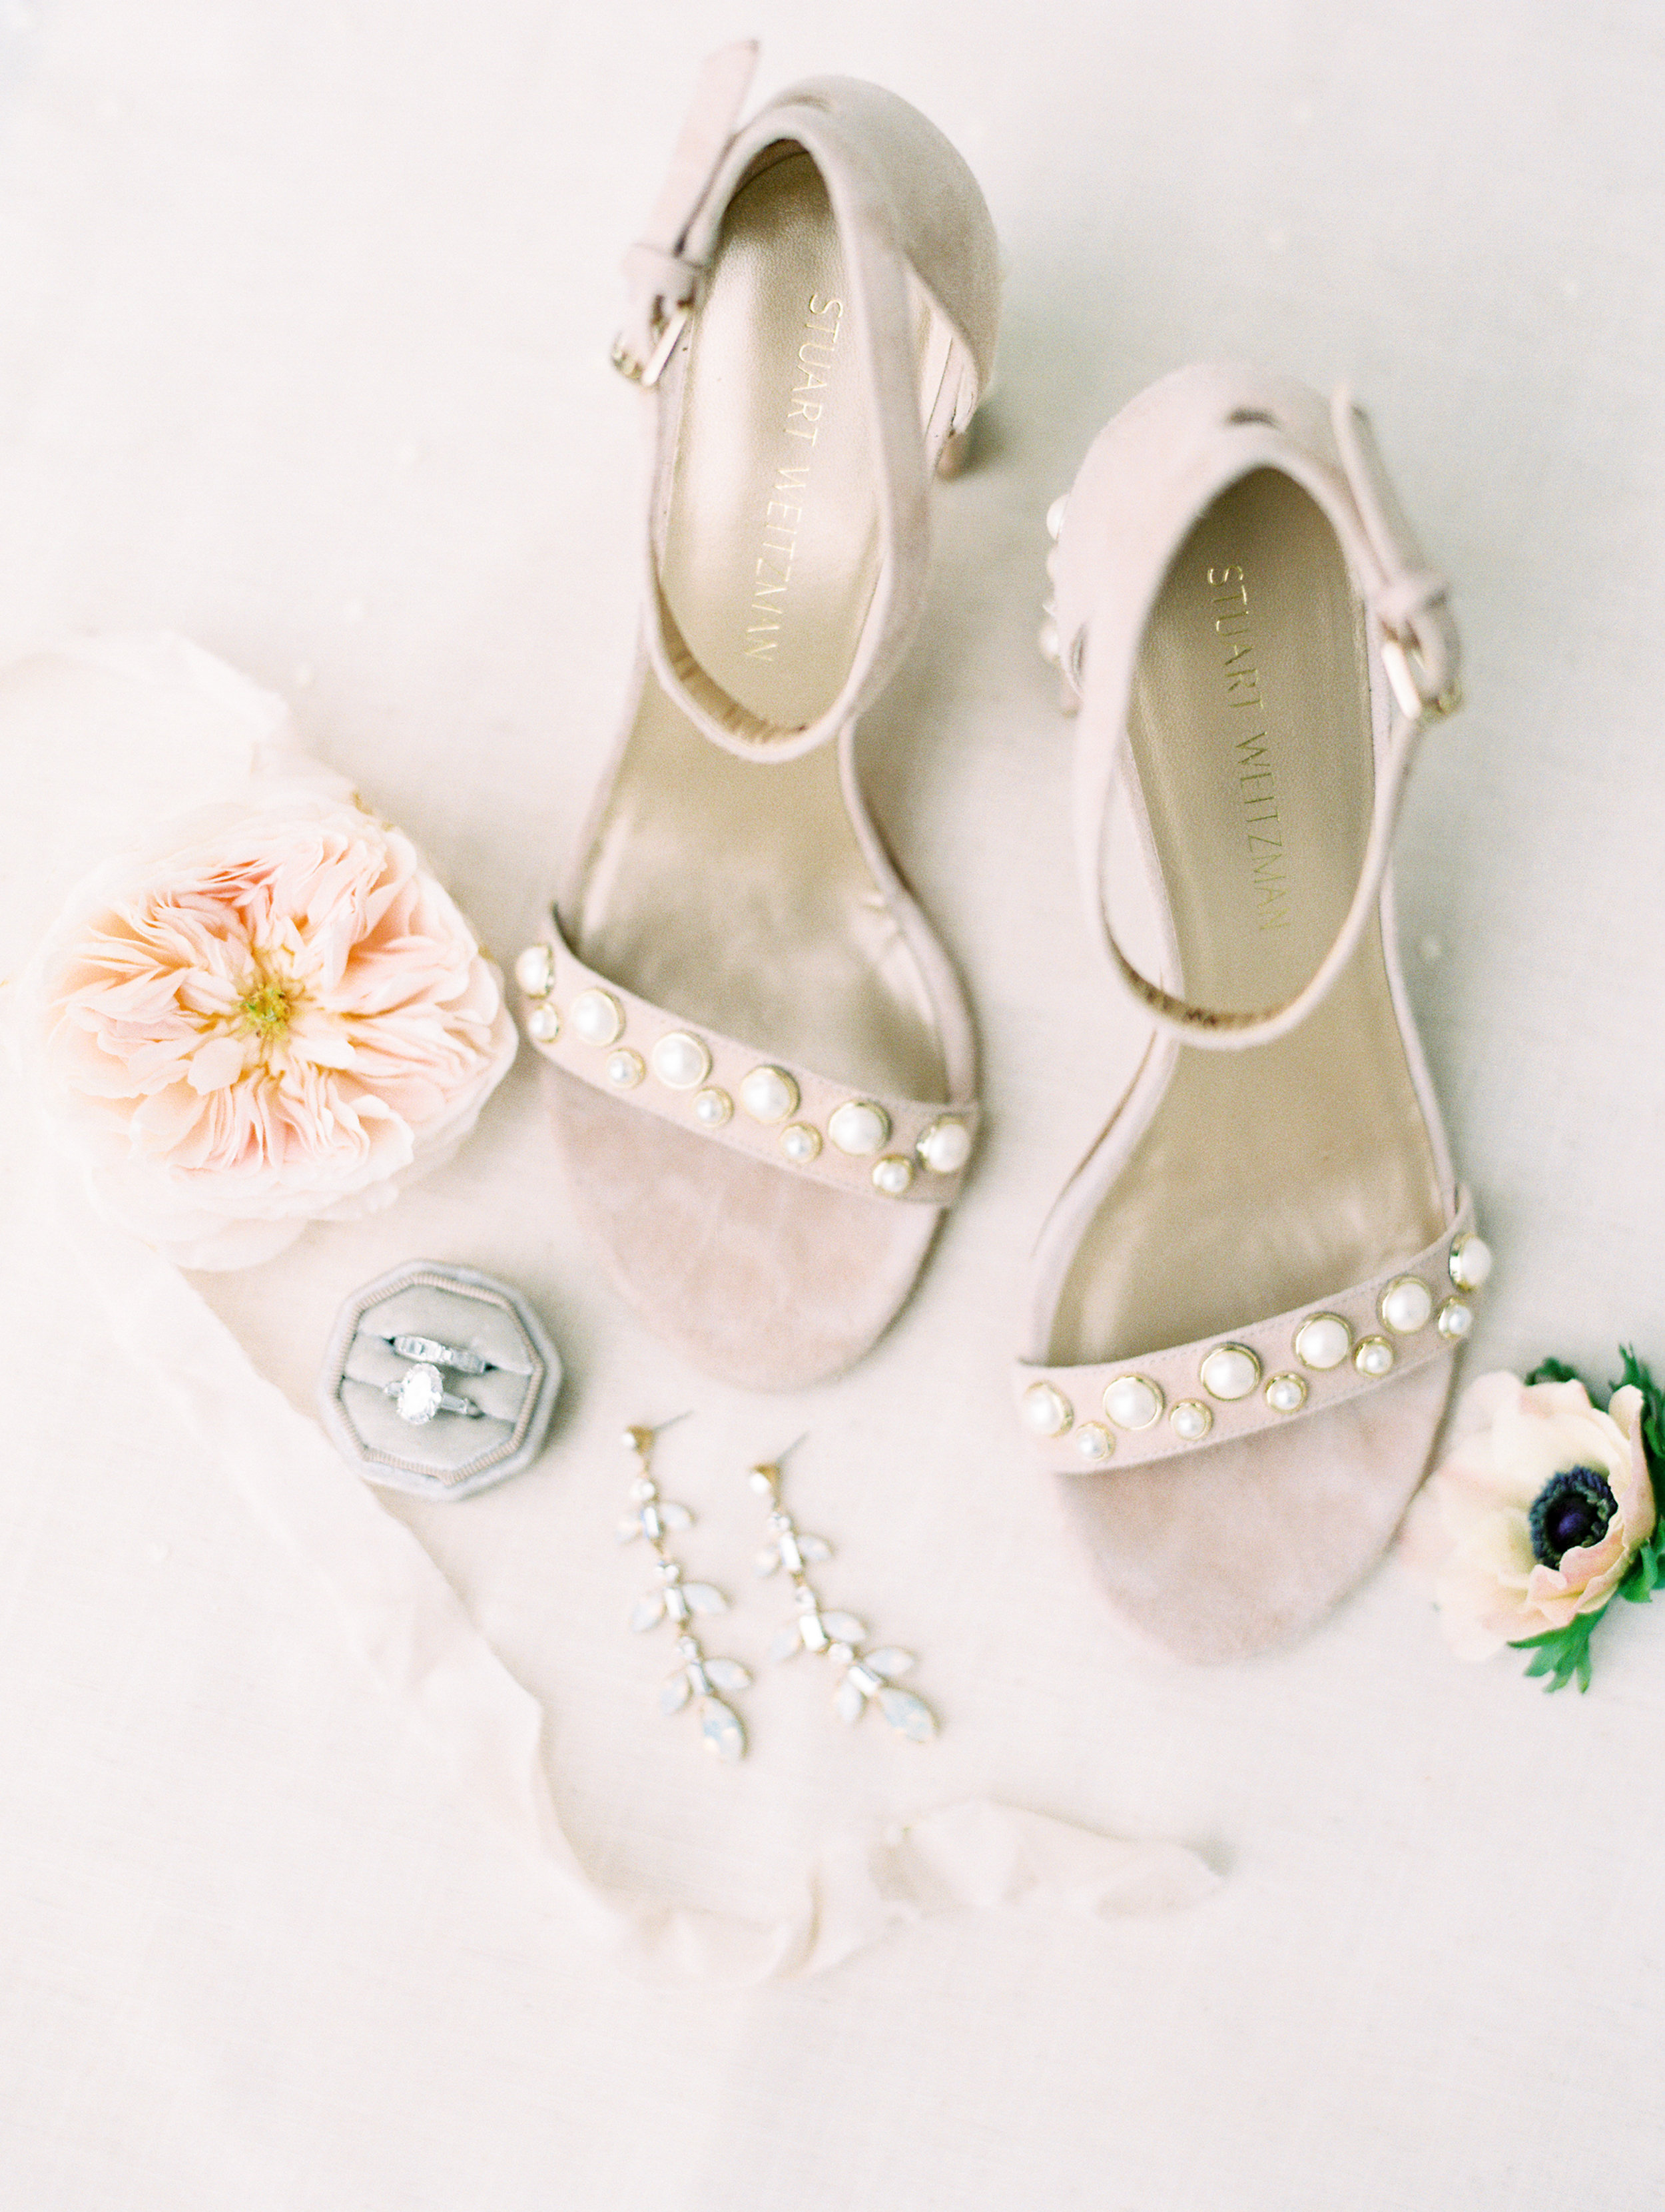 Coffman+Wedding+Details-58.jpg